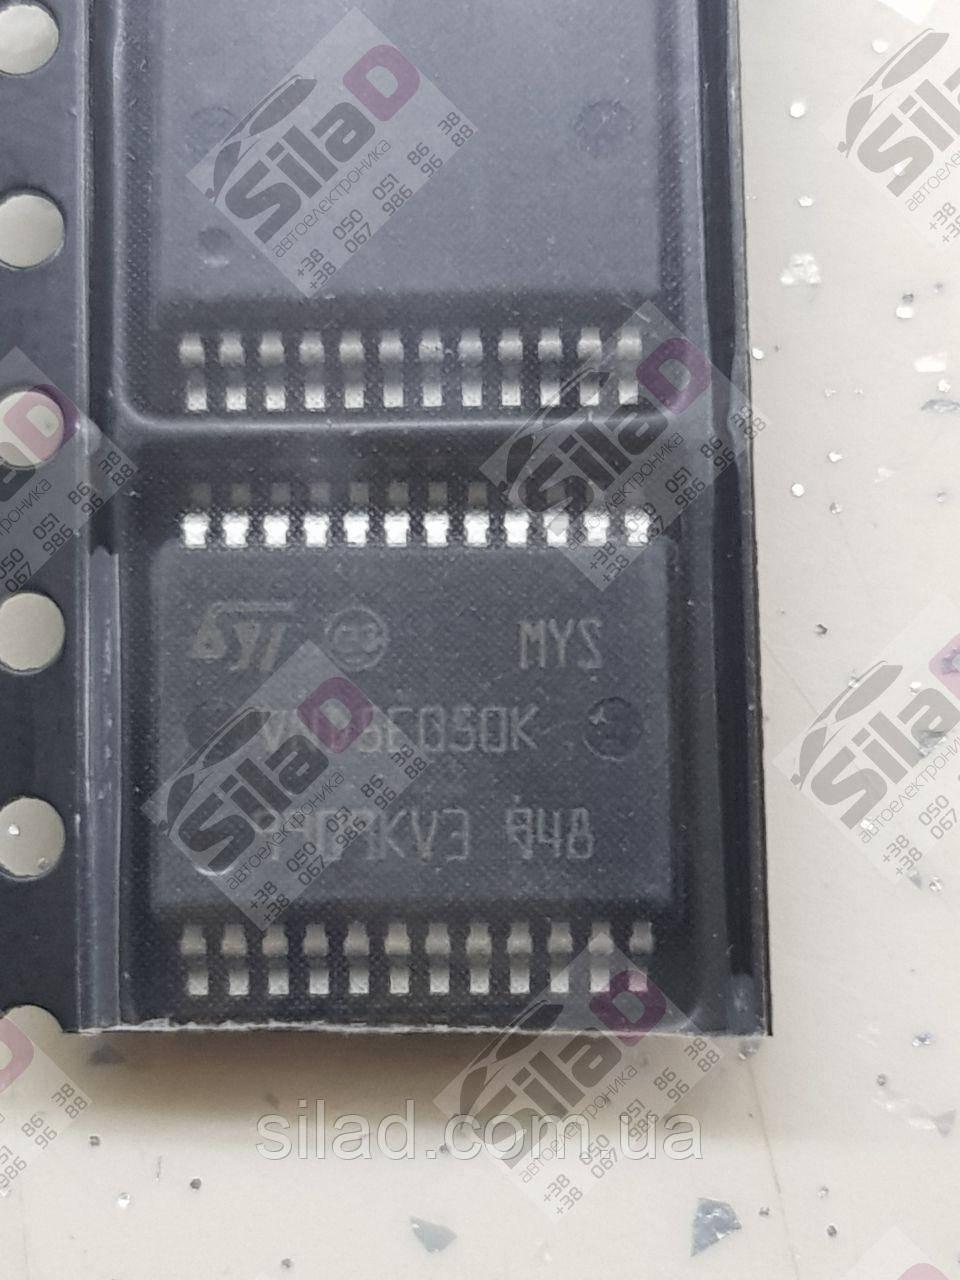 Мікросхема VND5E050K STMicroelectronics корпус PowerSSO-24